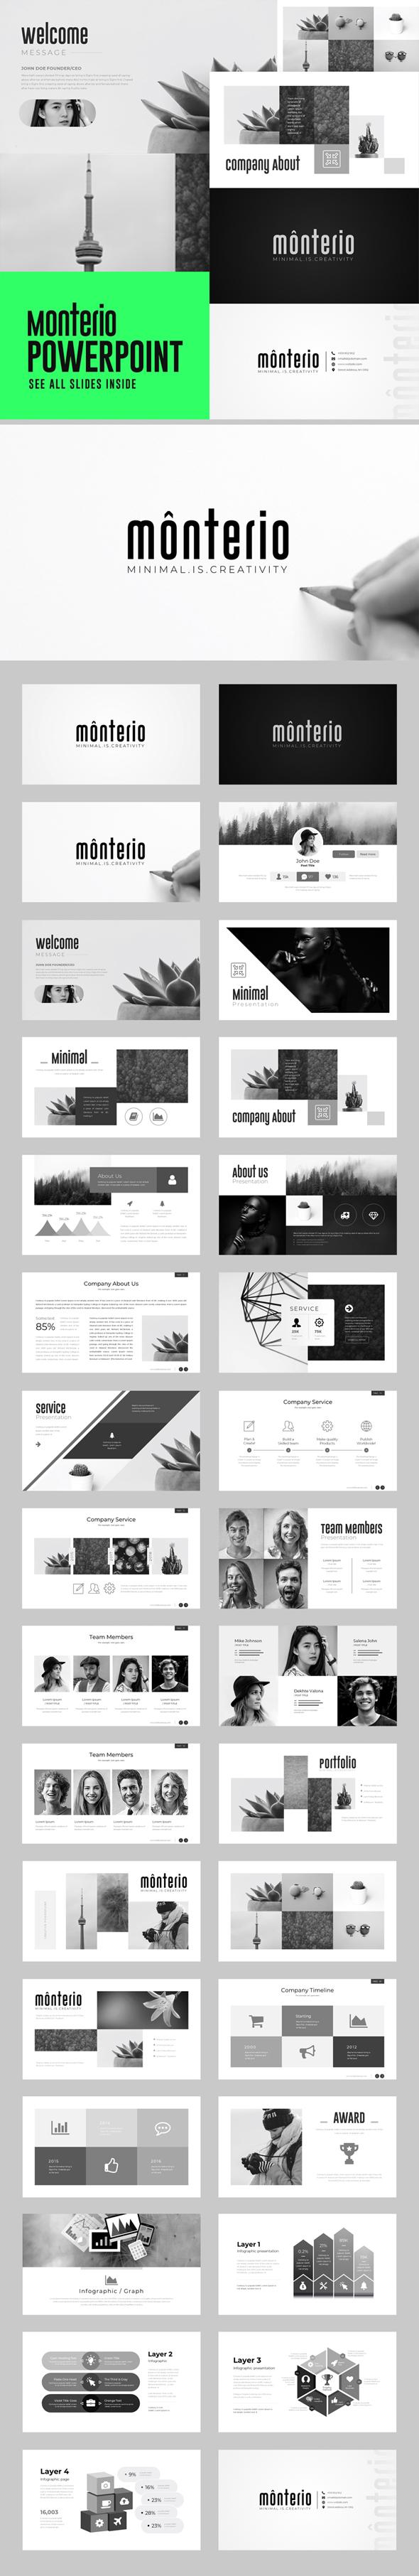 Monterio - Multipurpose PowerPoint Template - Business PowerPoint Templates